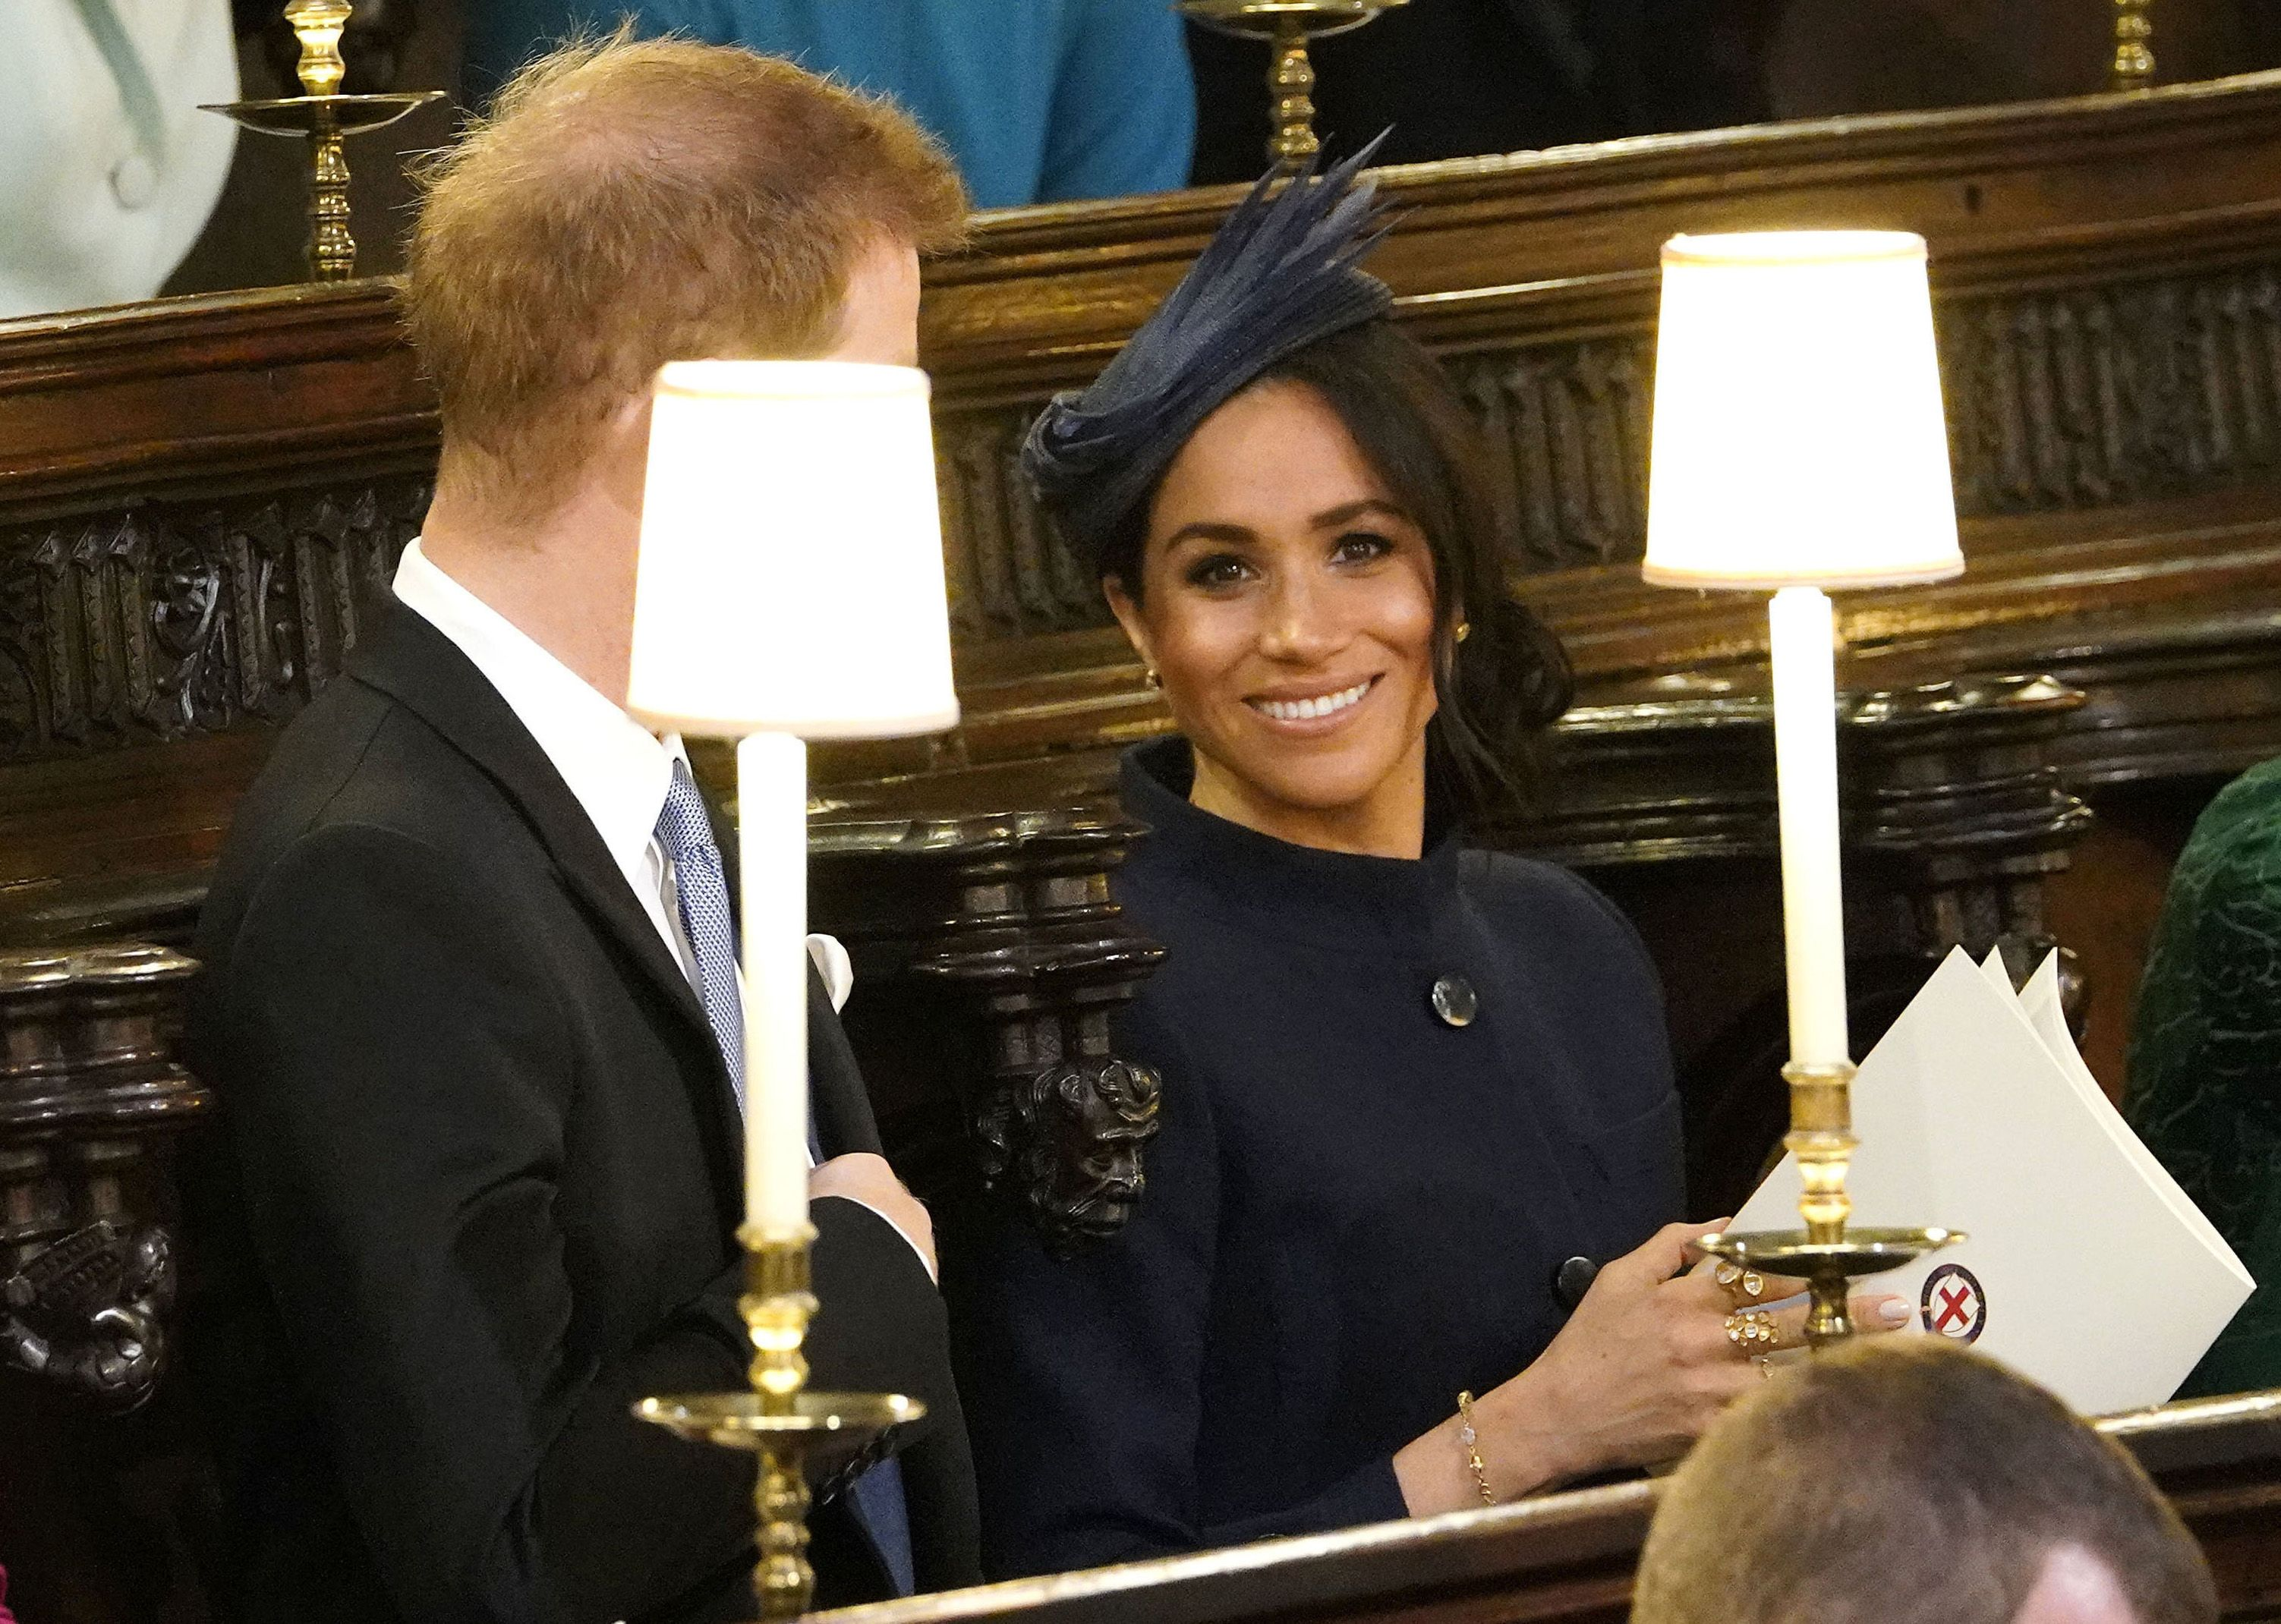 meghan markle at princess eugenie s royal wedding photos of meghan markle s givenchy dress meghan markle at princess eugenie s